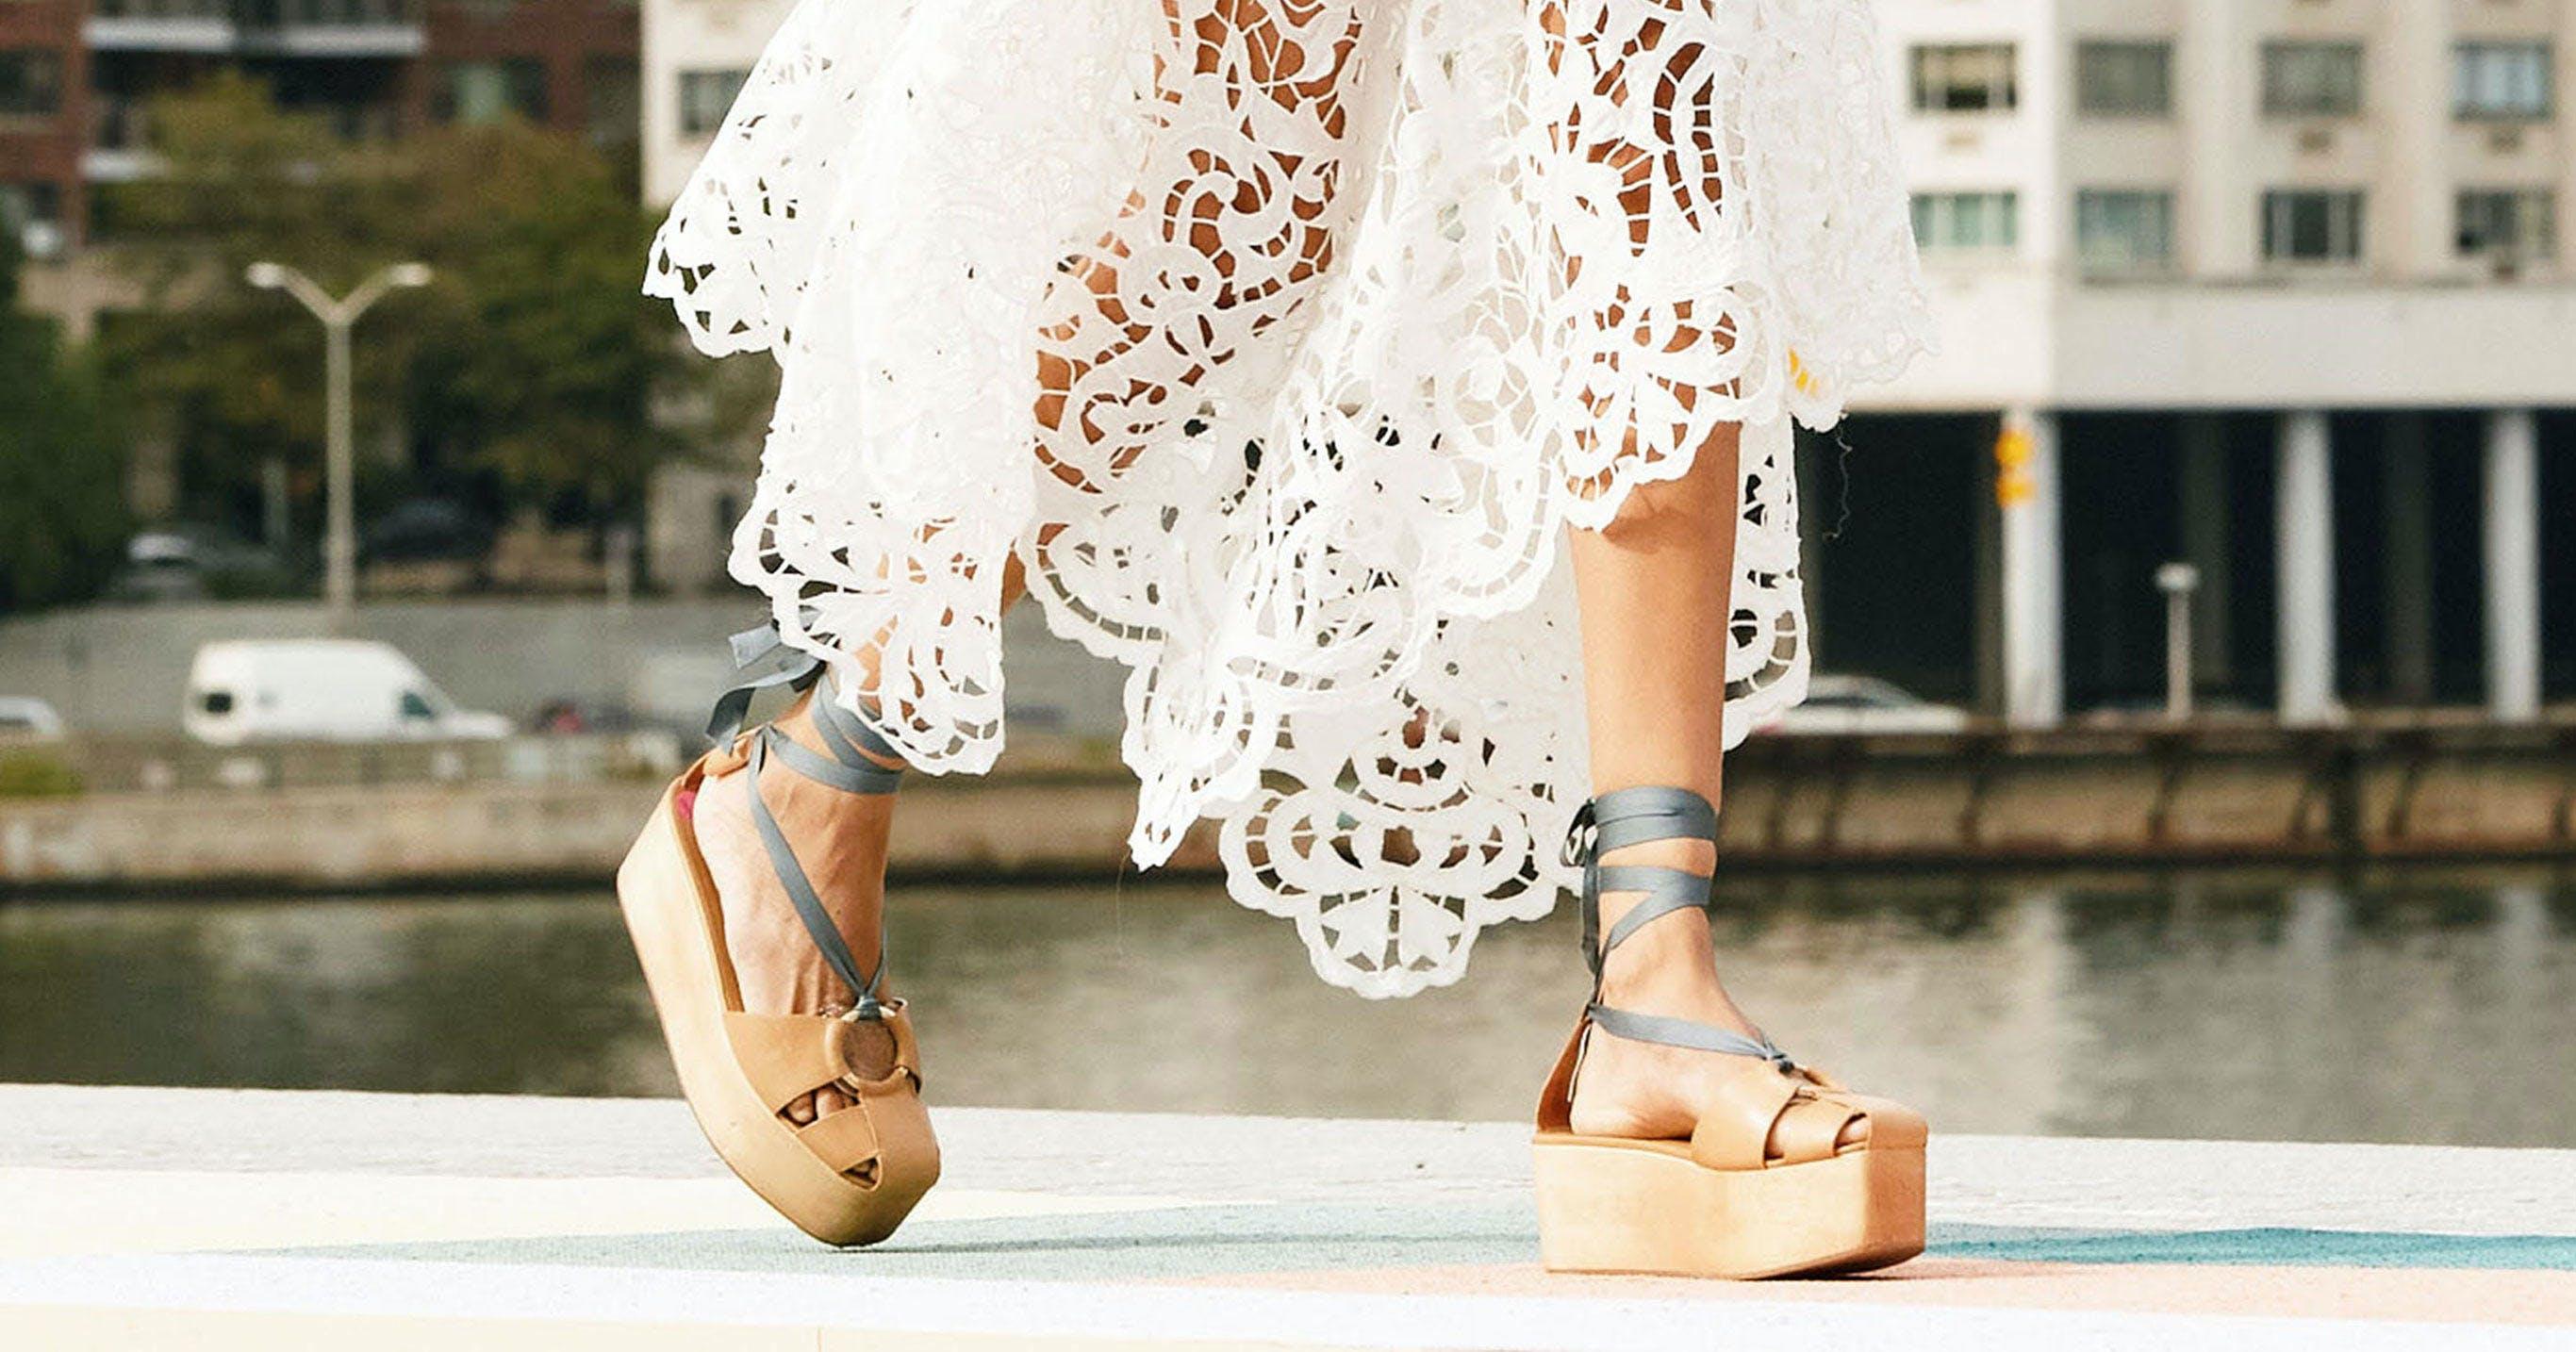 The Top Shoe Trend of Summer 2021 Has Comfort Written All Over It